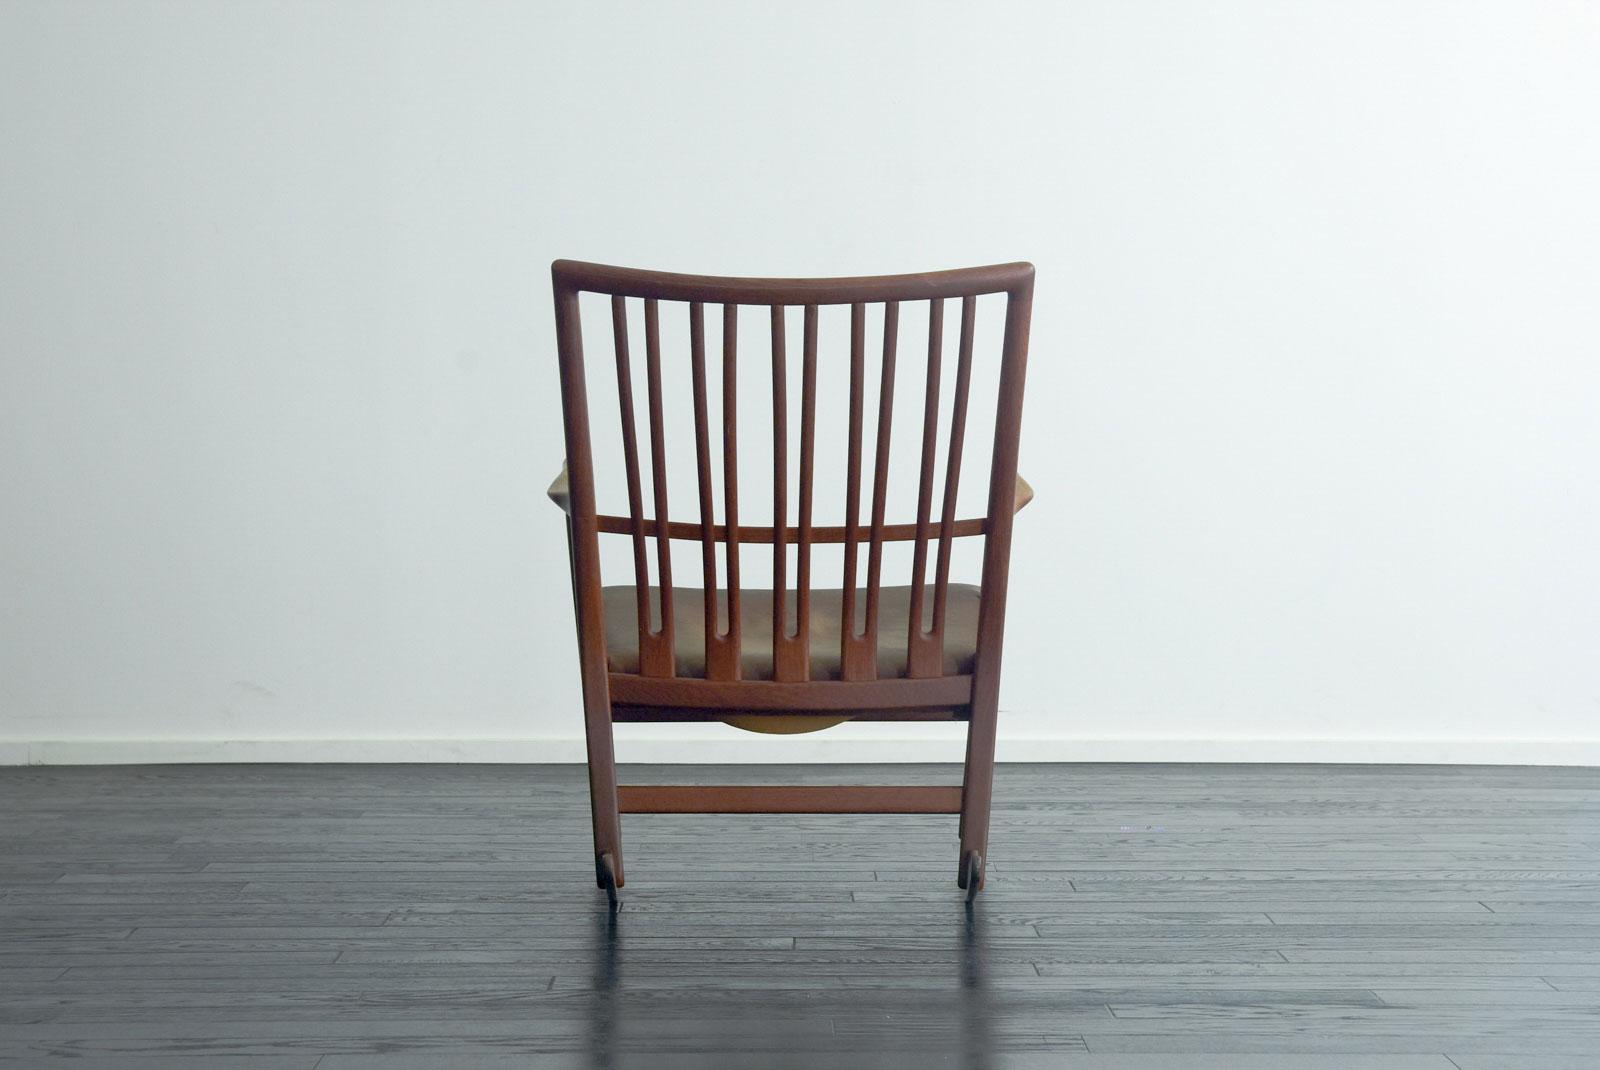 ML-33 Rocking Chair by Hans J Wegner